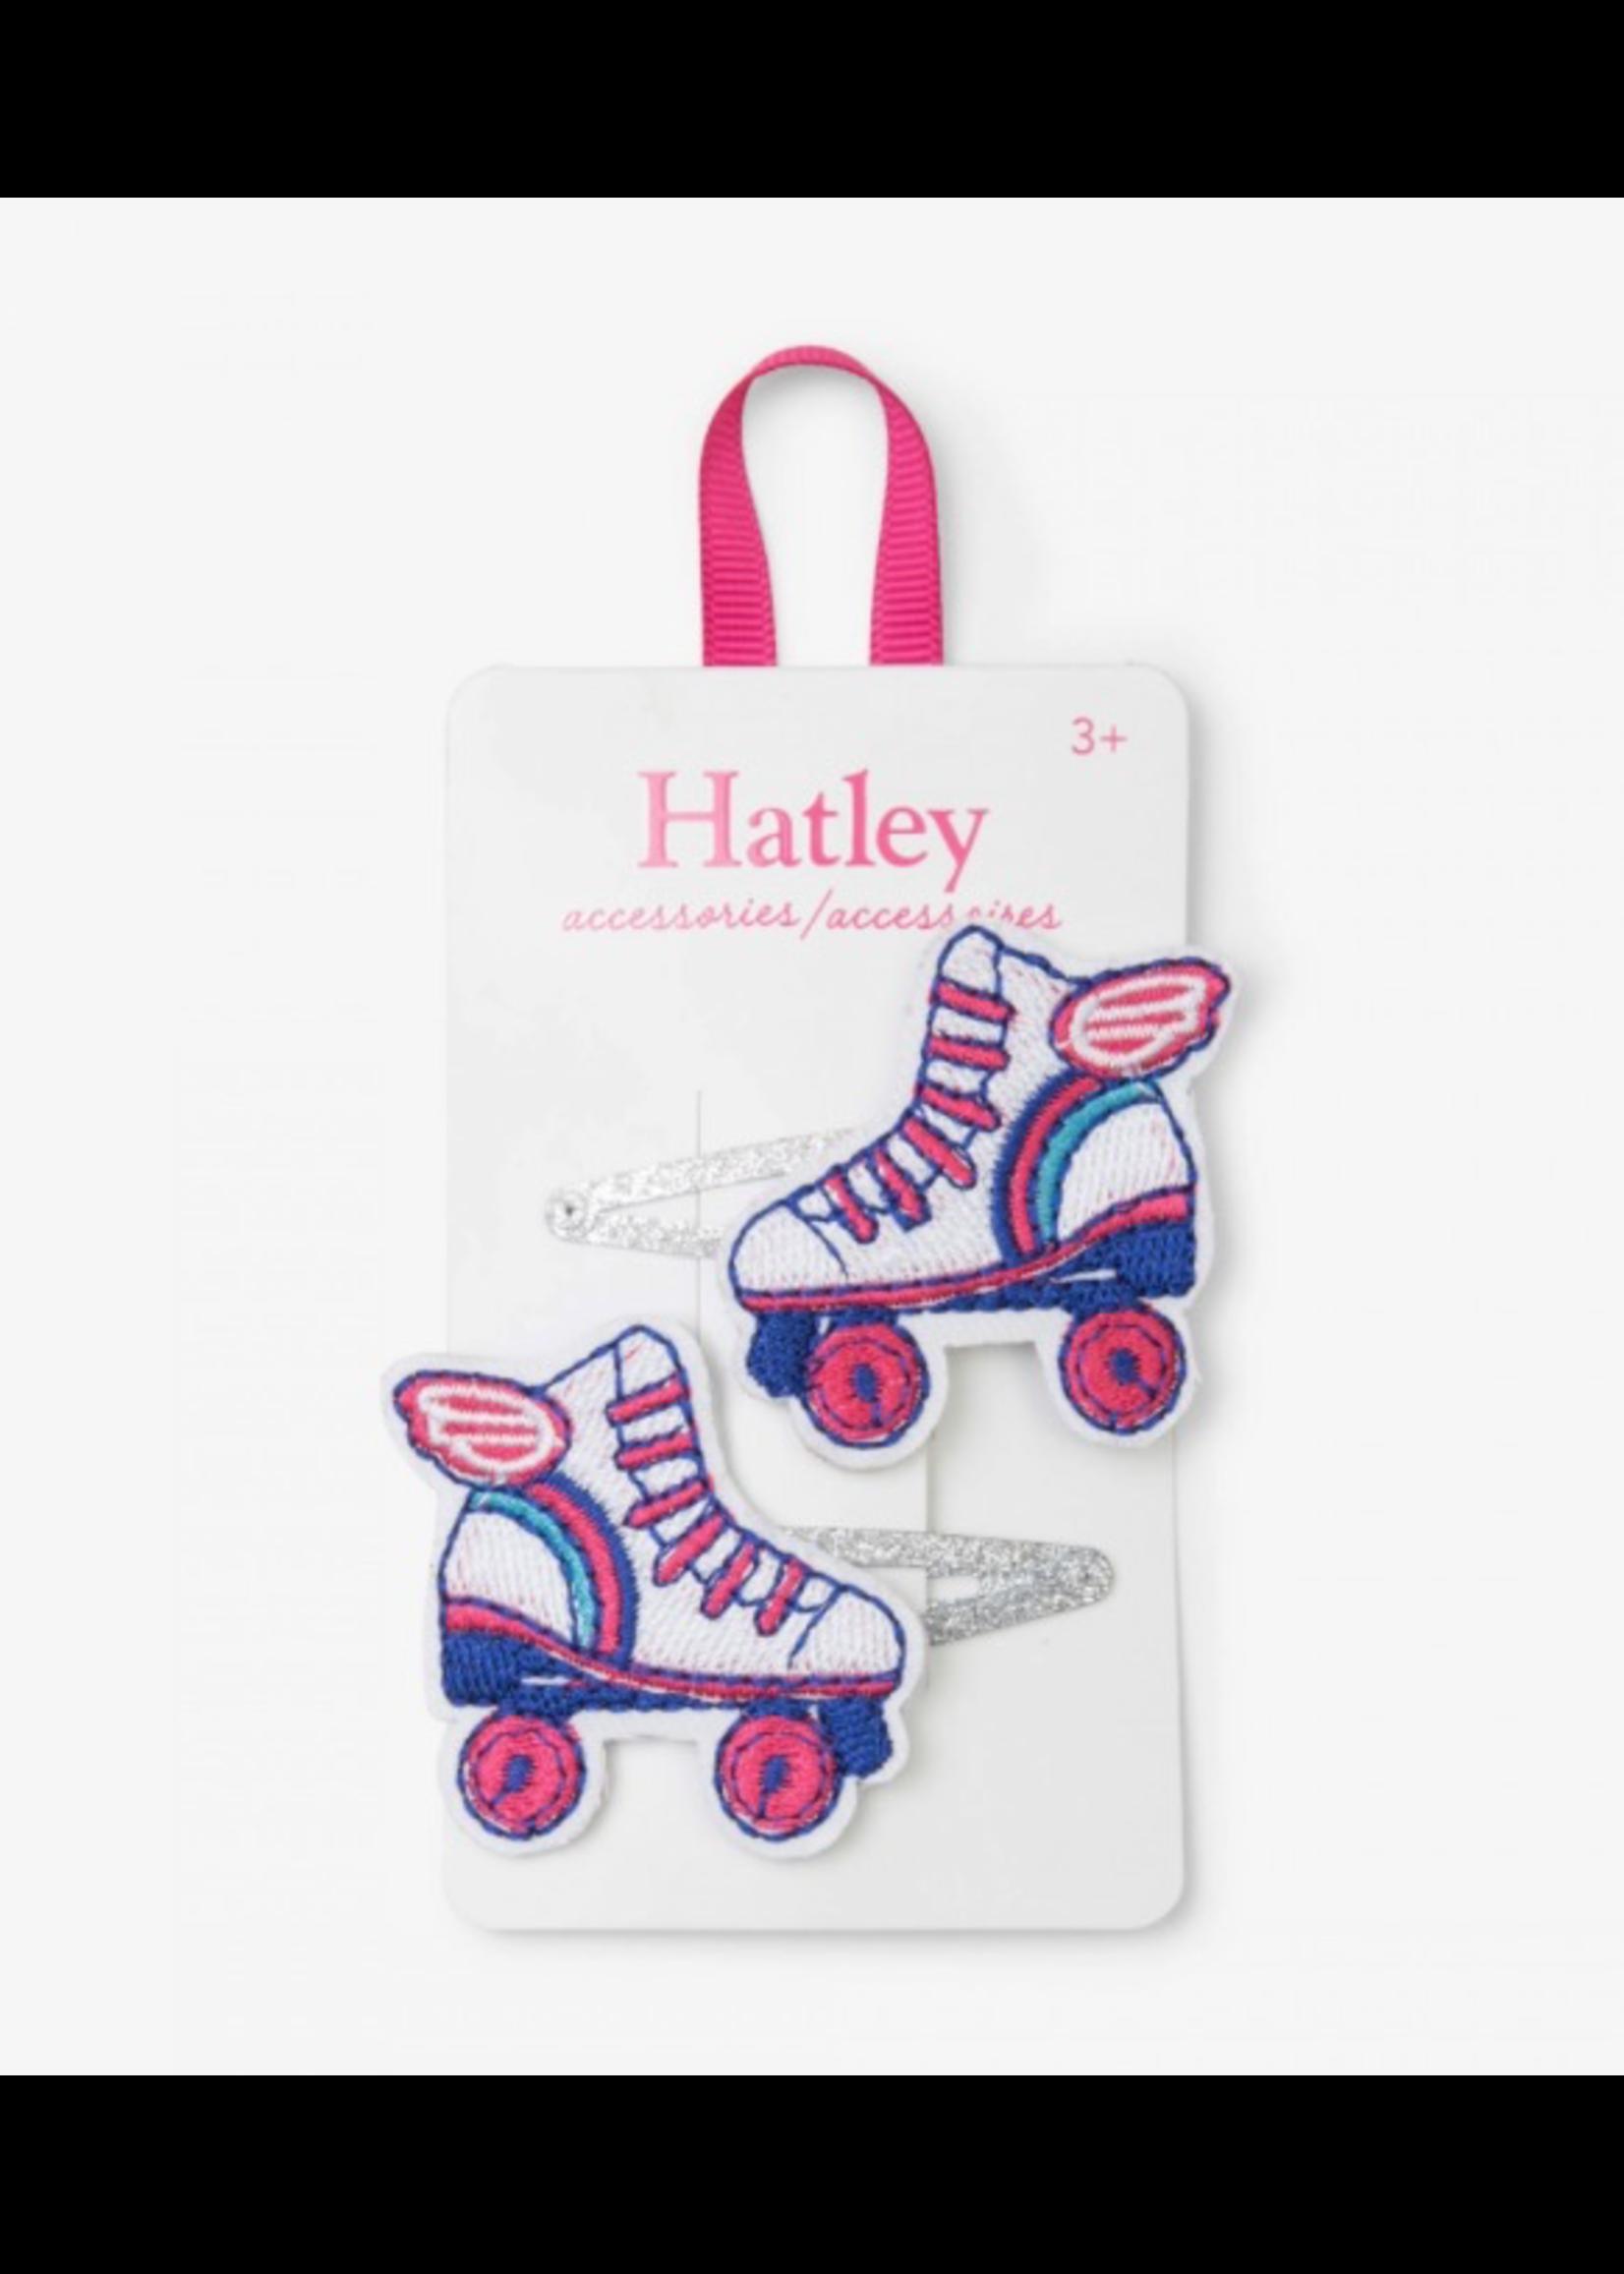 Hatley Hatley, Roller Skates Snap Clips